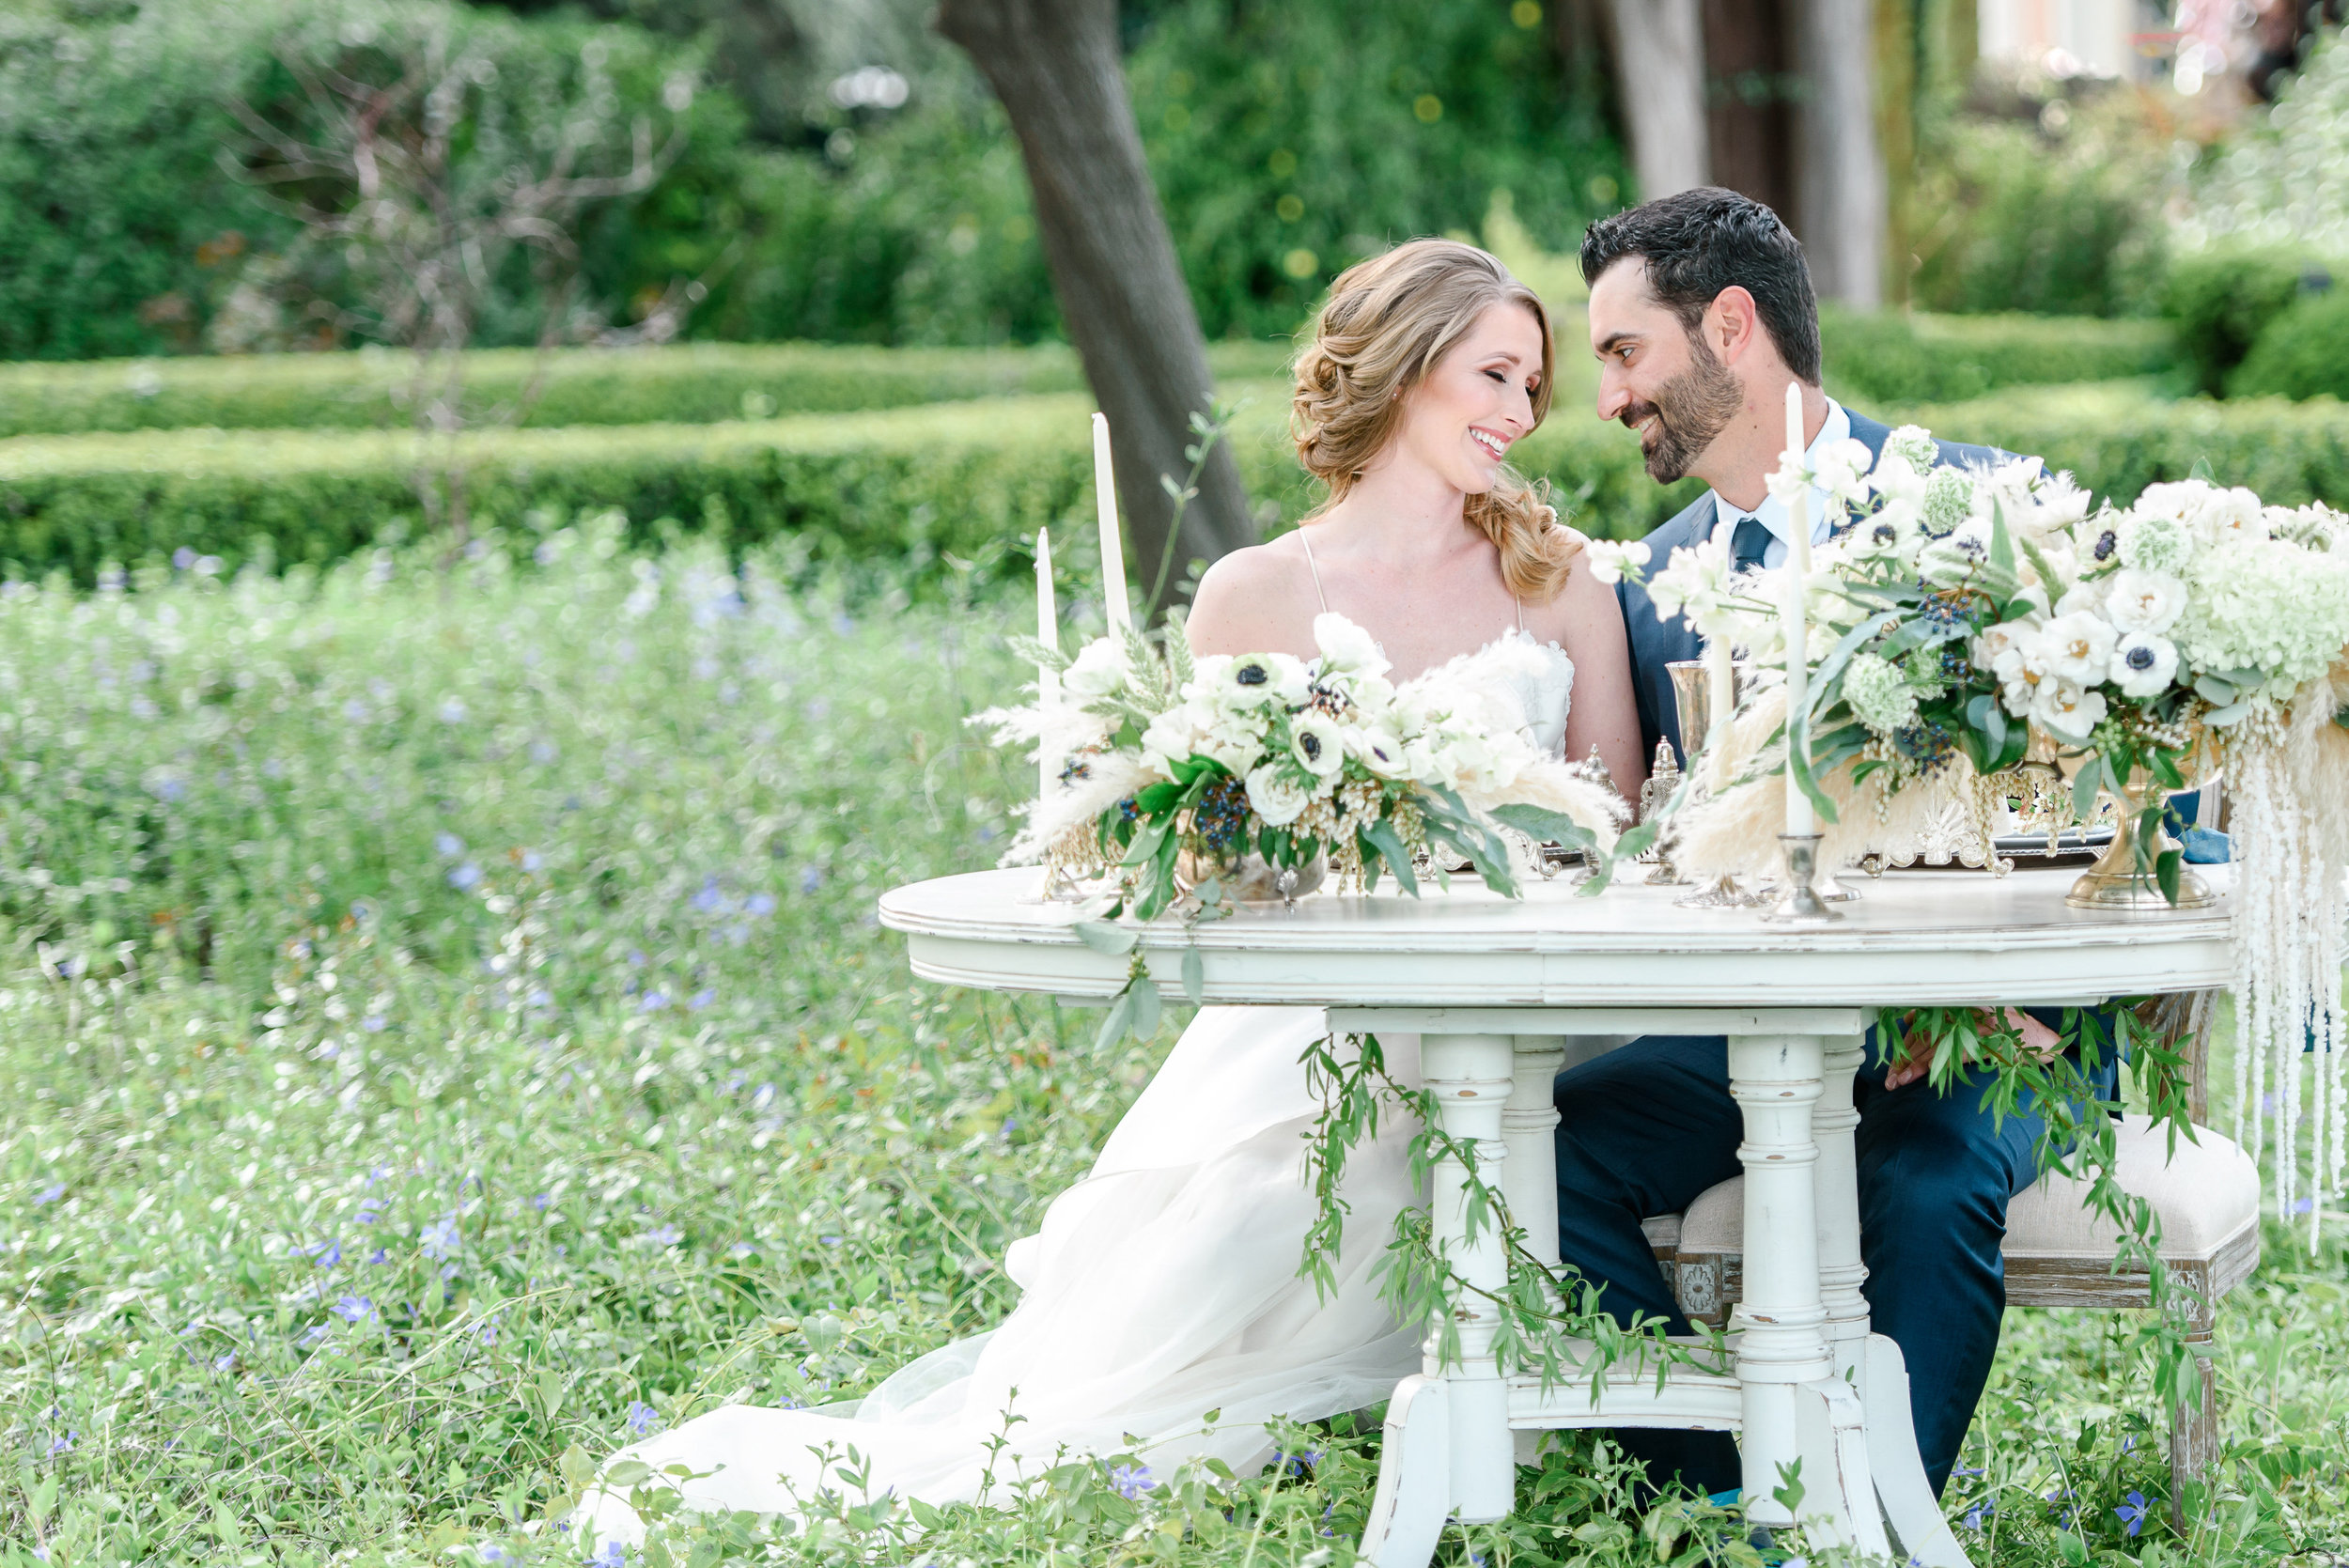 Sweetheart Wedding Table | Garden Wedding Inspiration | Neutral Wedding Colors